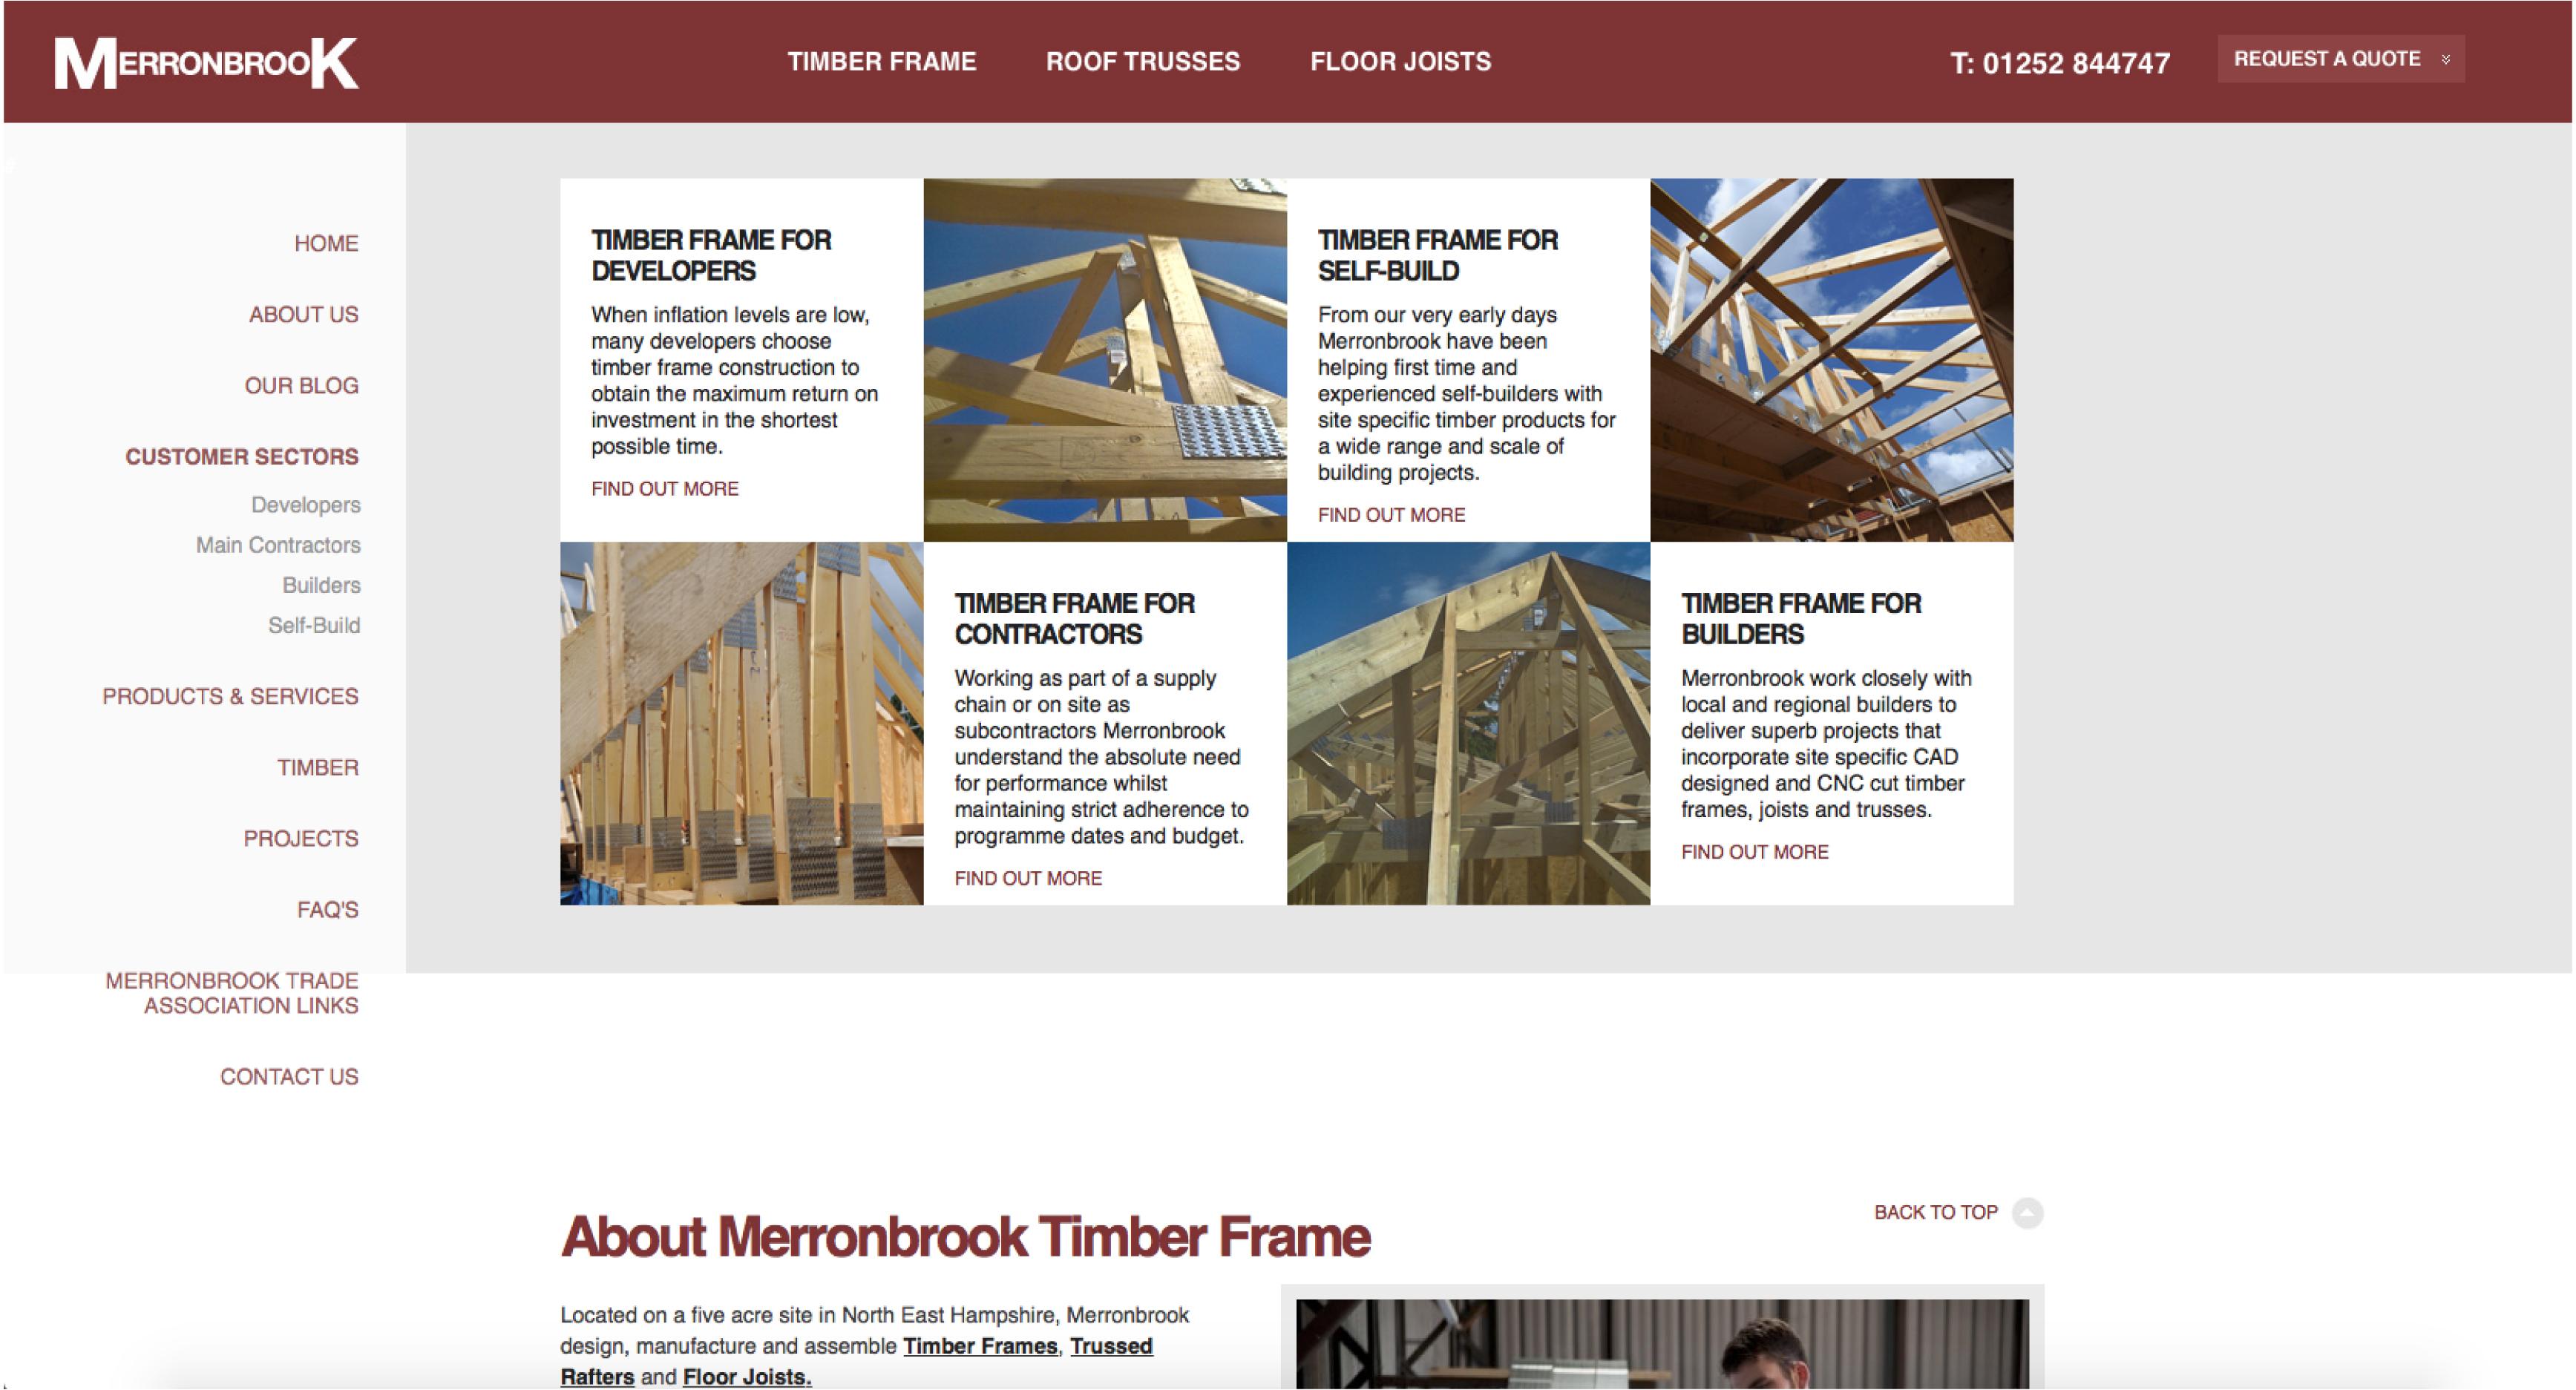 further homepage